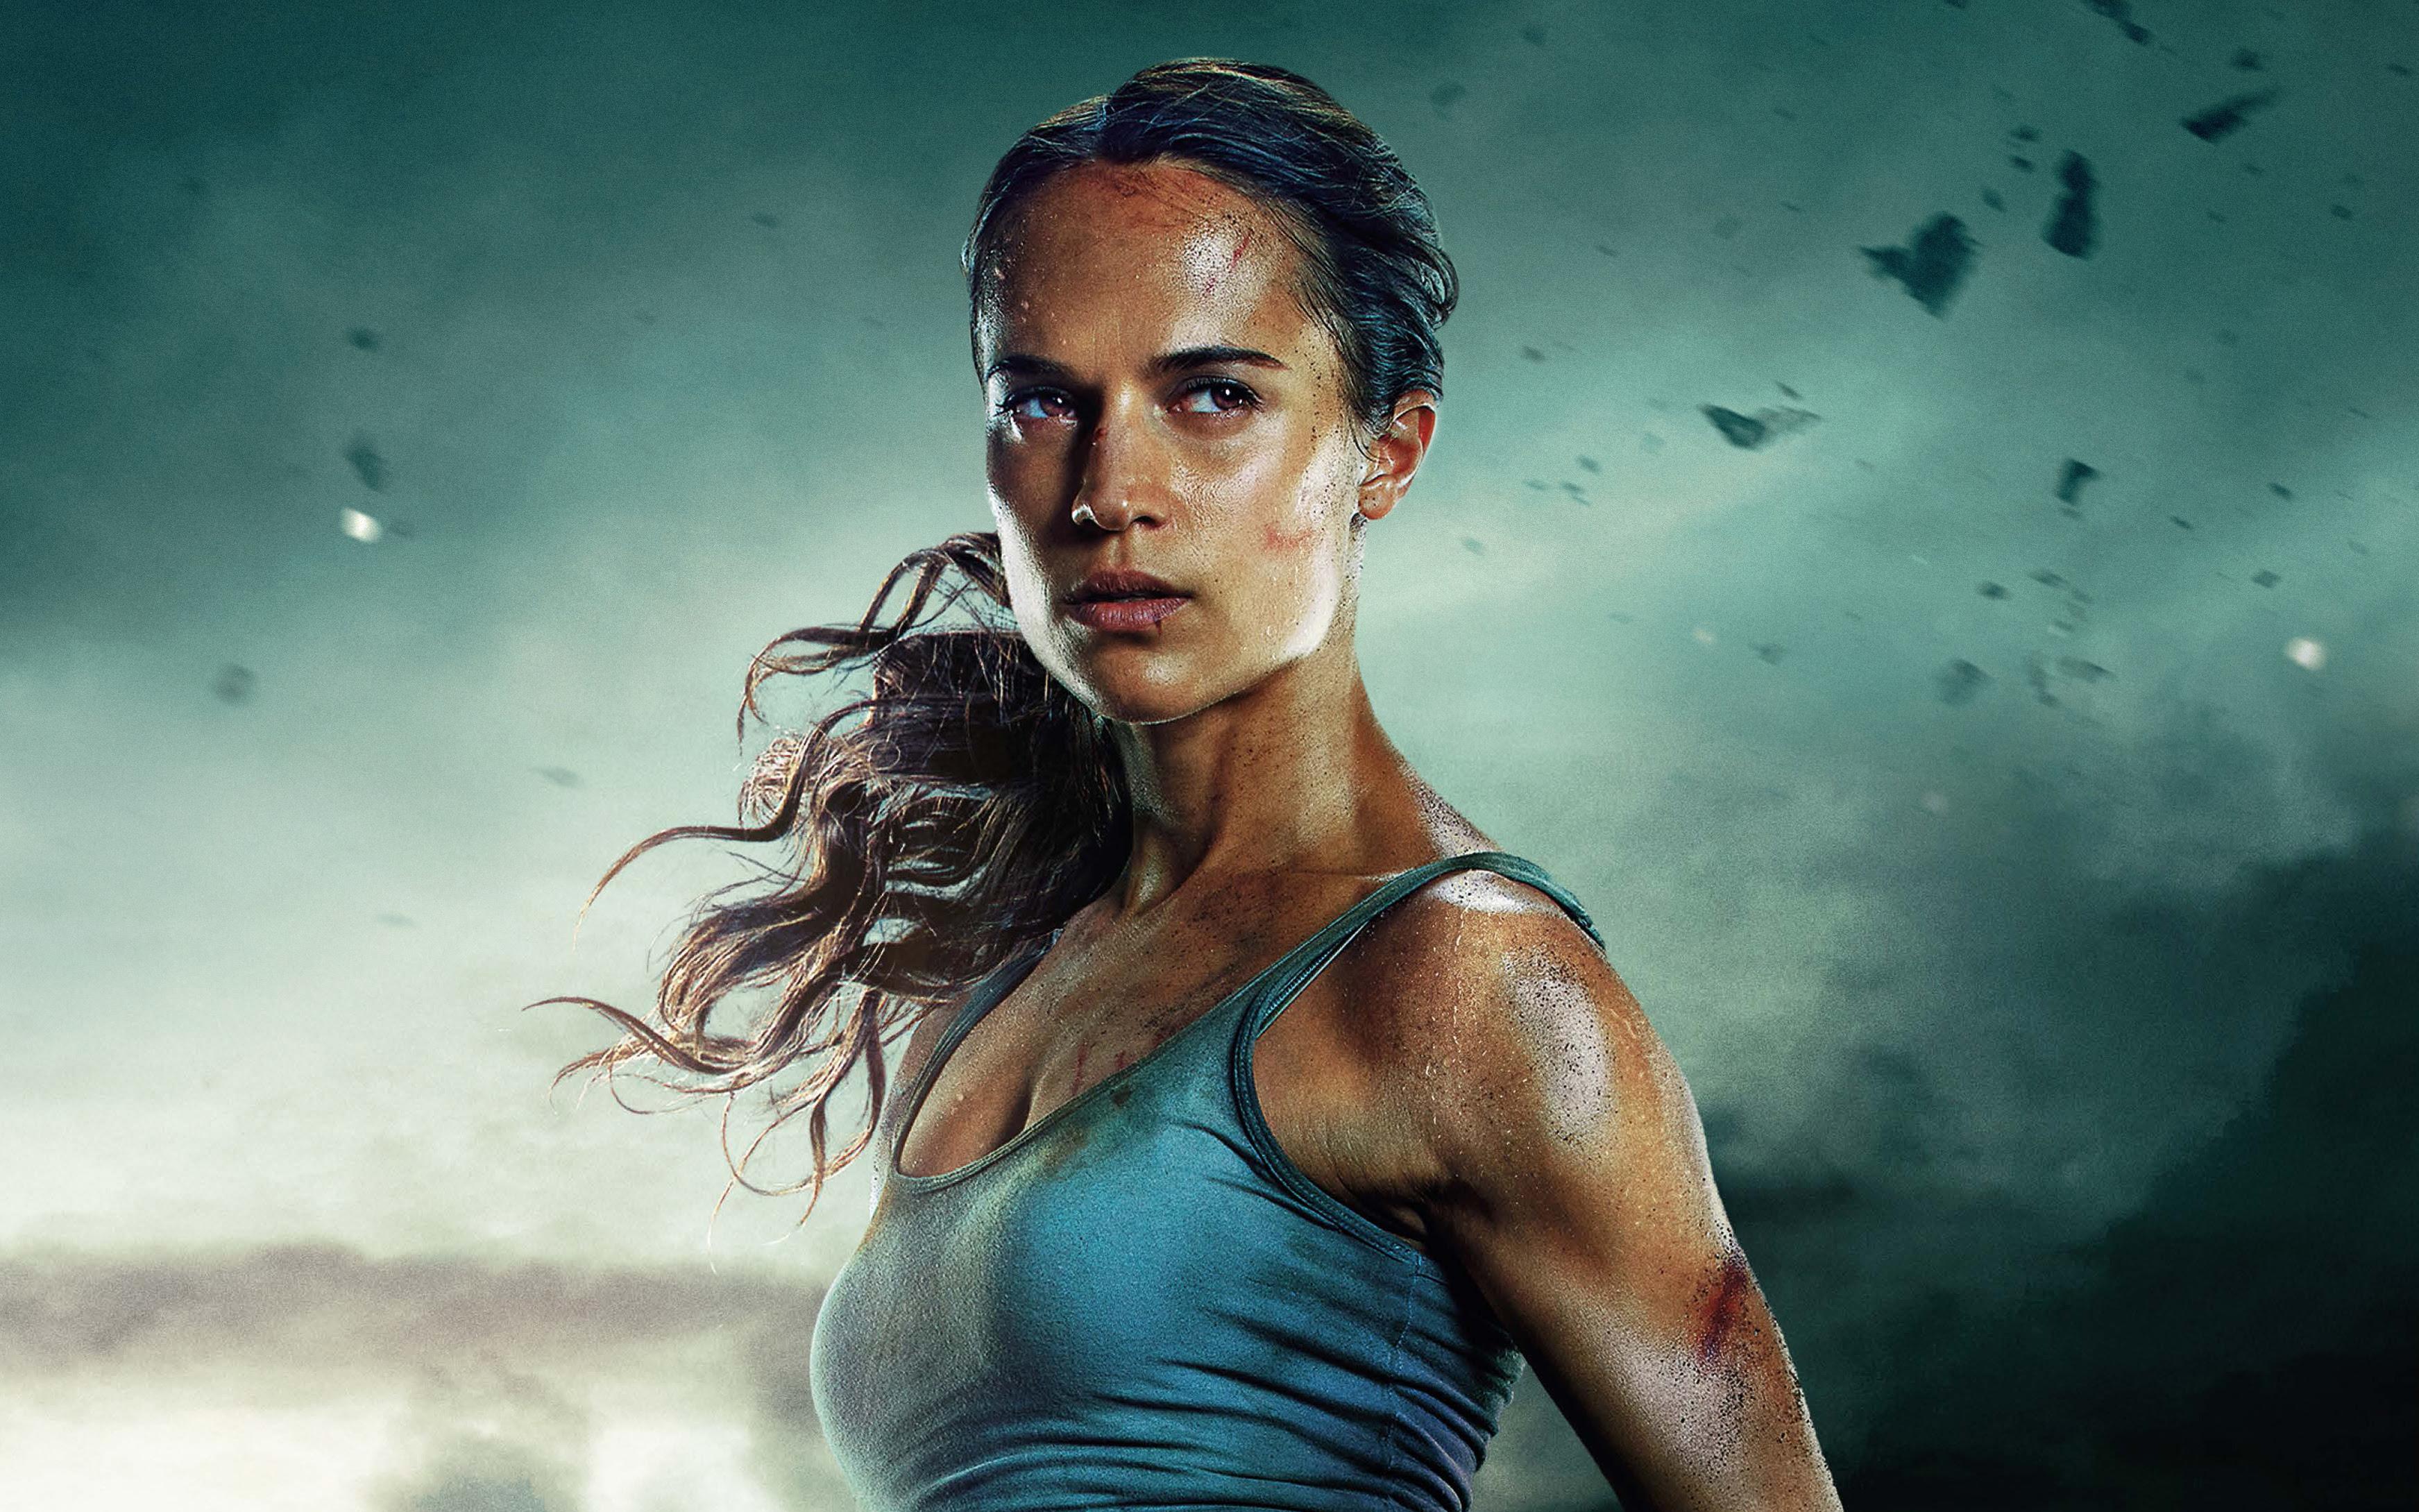 Alicia Vikander As Lara Croft In Tomb Raider Wallpapers Hd